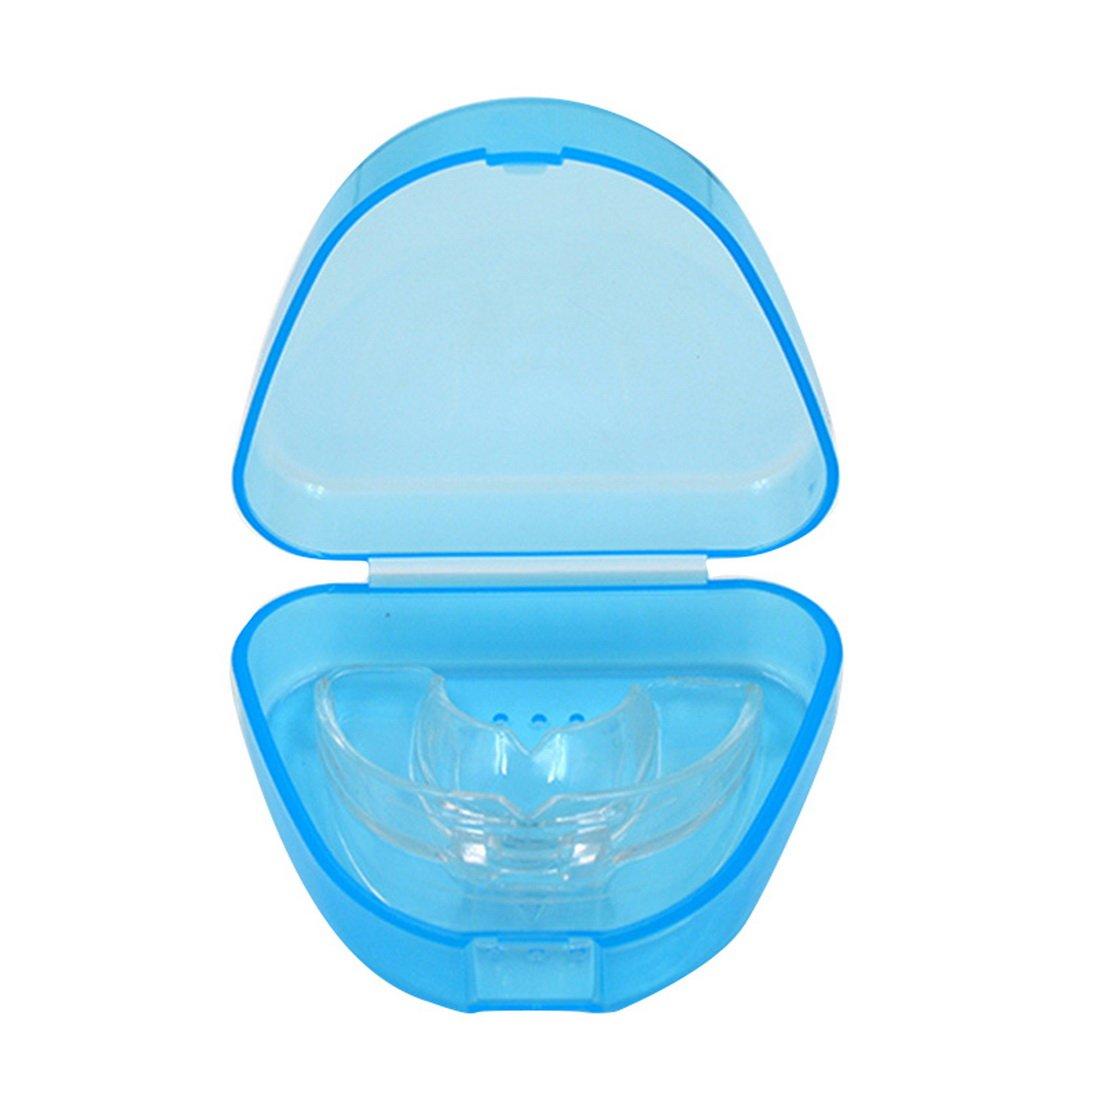 Loweryeah Plastic Dental Braces Box Mouth Guards Denture Storage Container